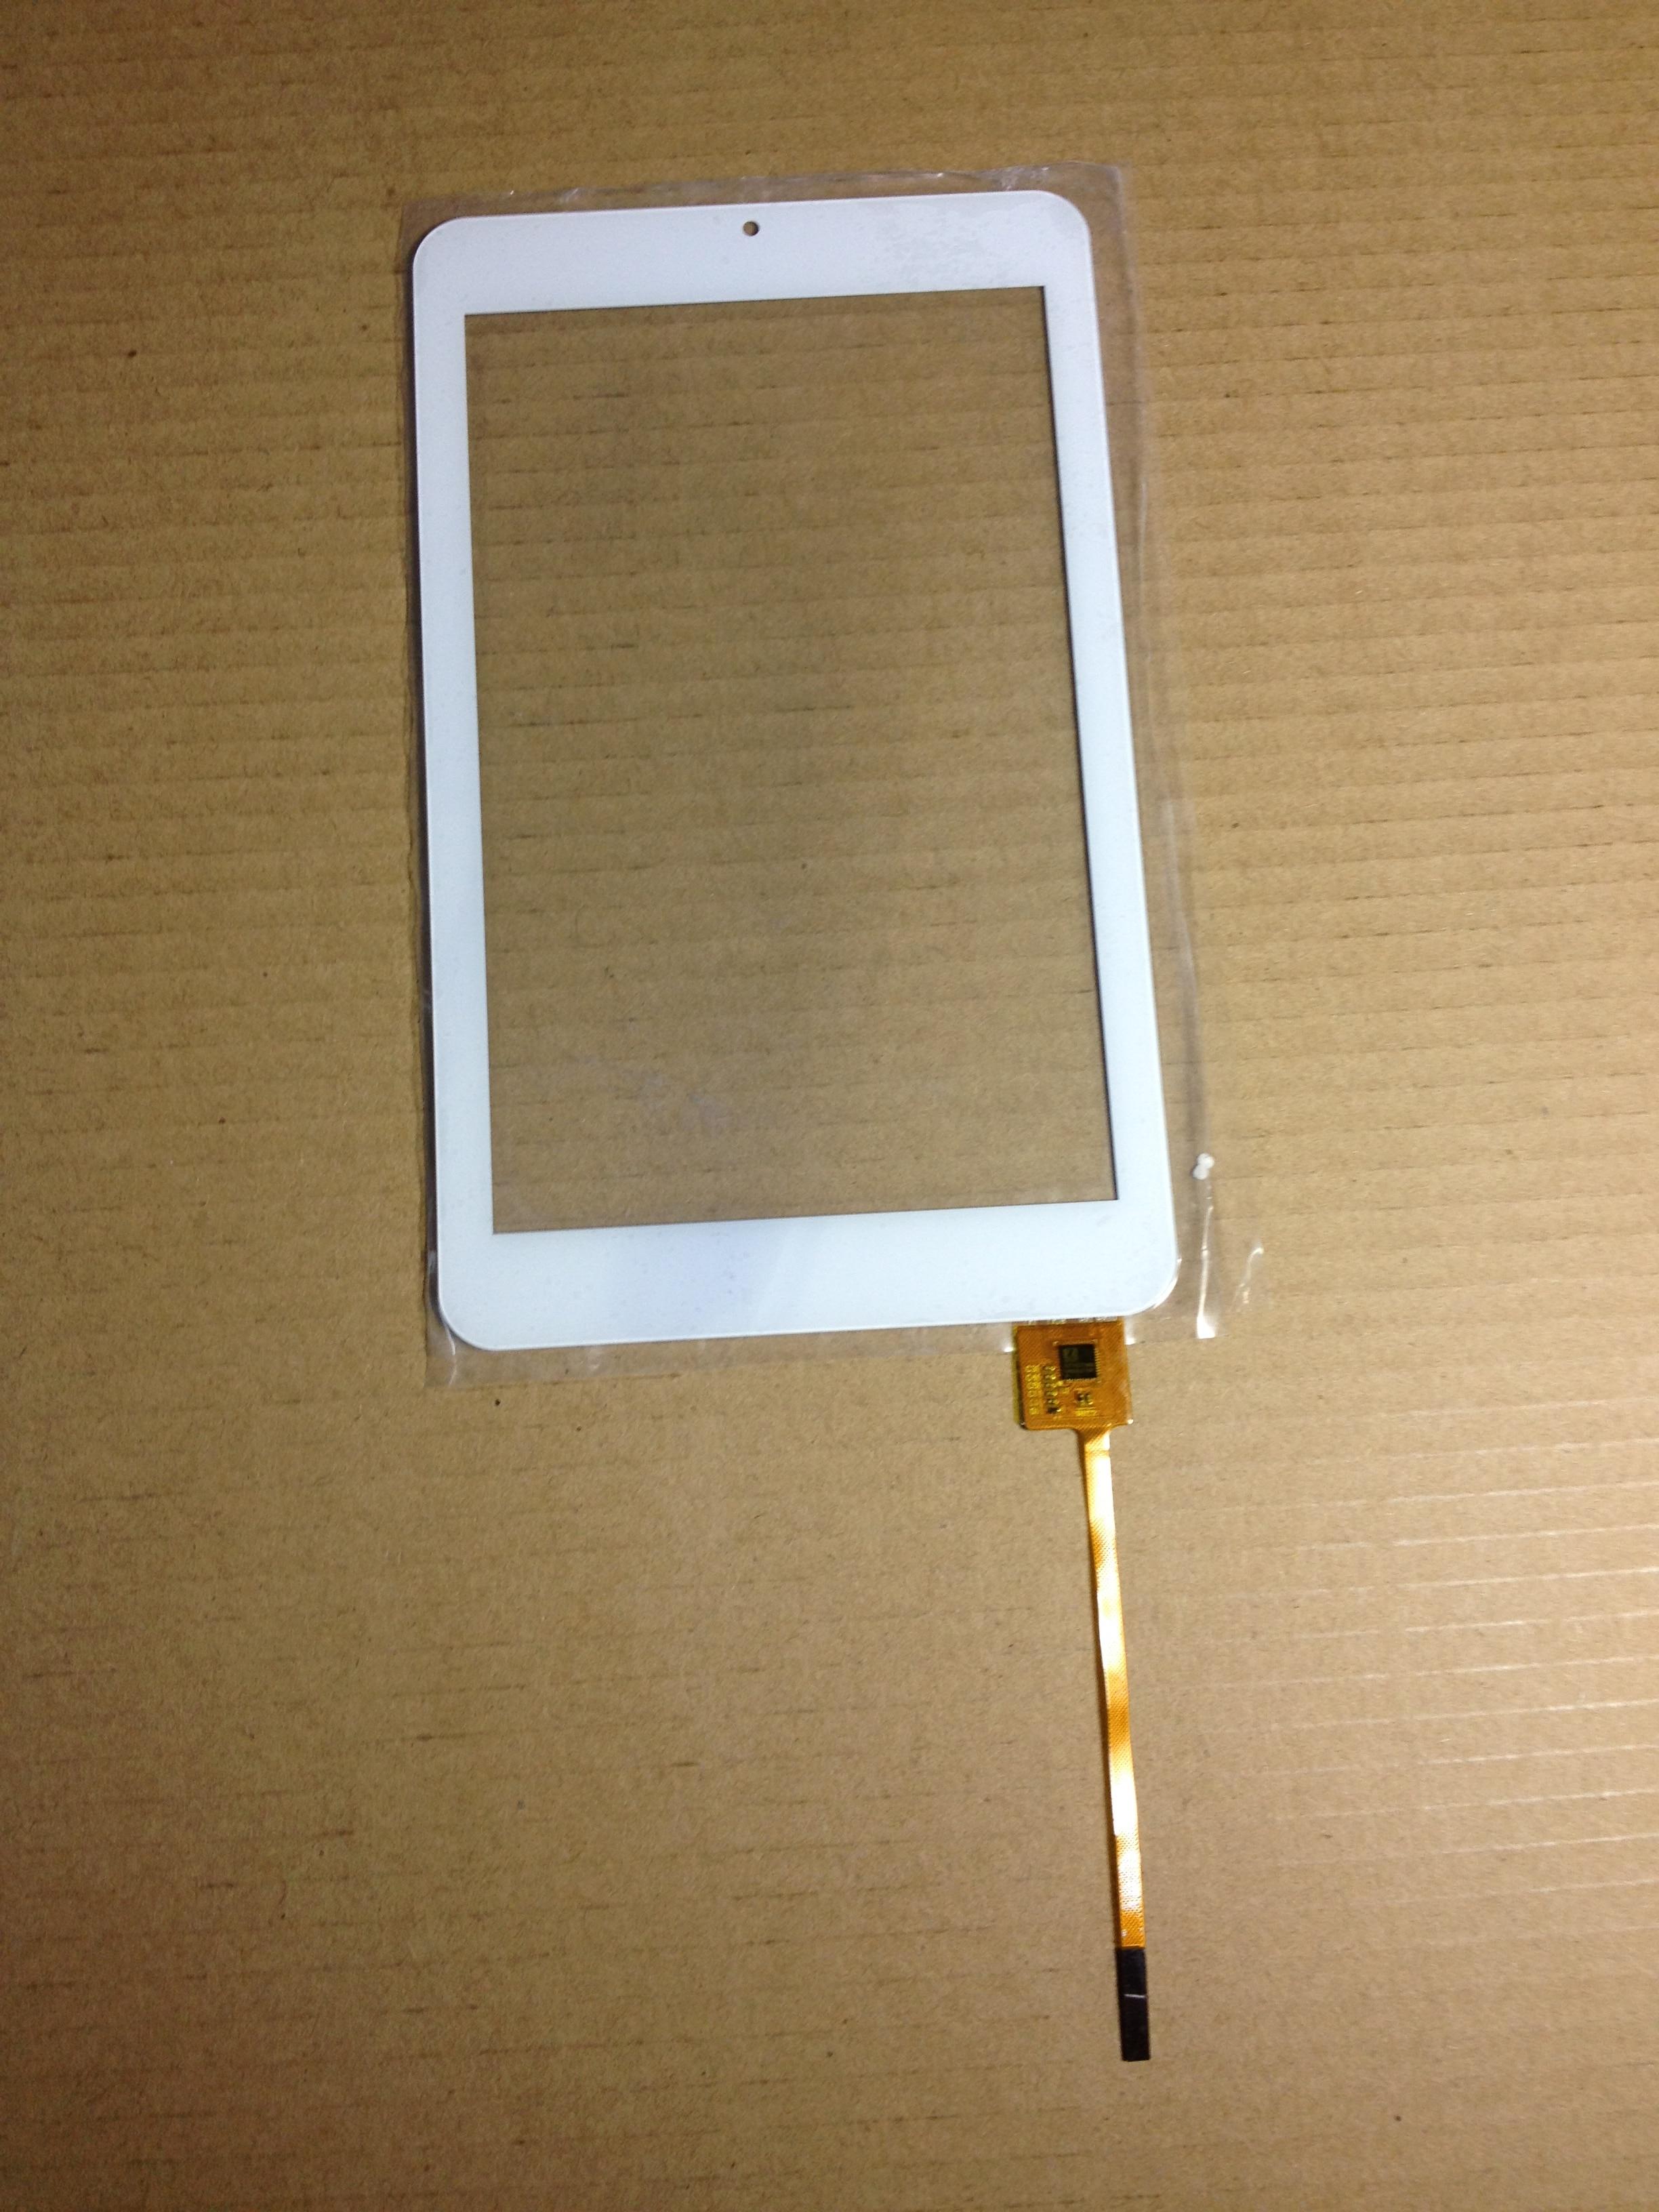 Blanco de 7 pulgadas para Digma iDsQ7 Ritmix RMD-770 Turbopad 702 tablet pc pantalla táctil capacitiva panel digitalizador de vidrio